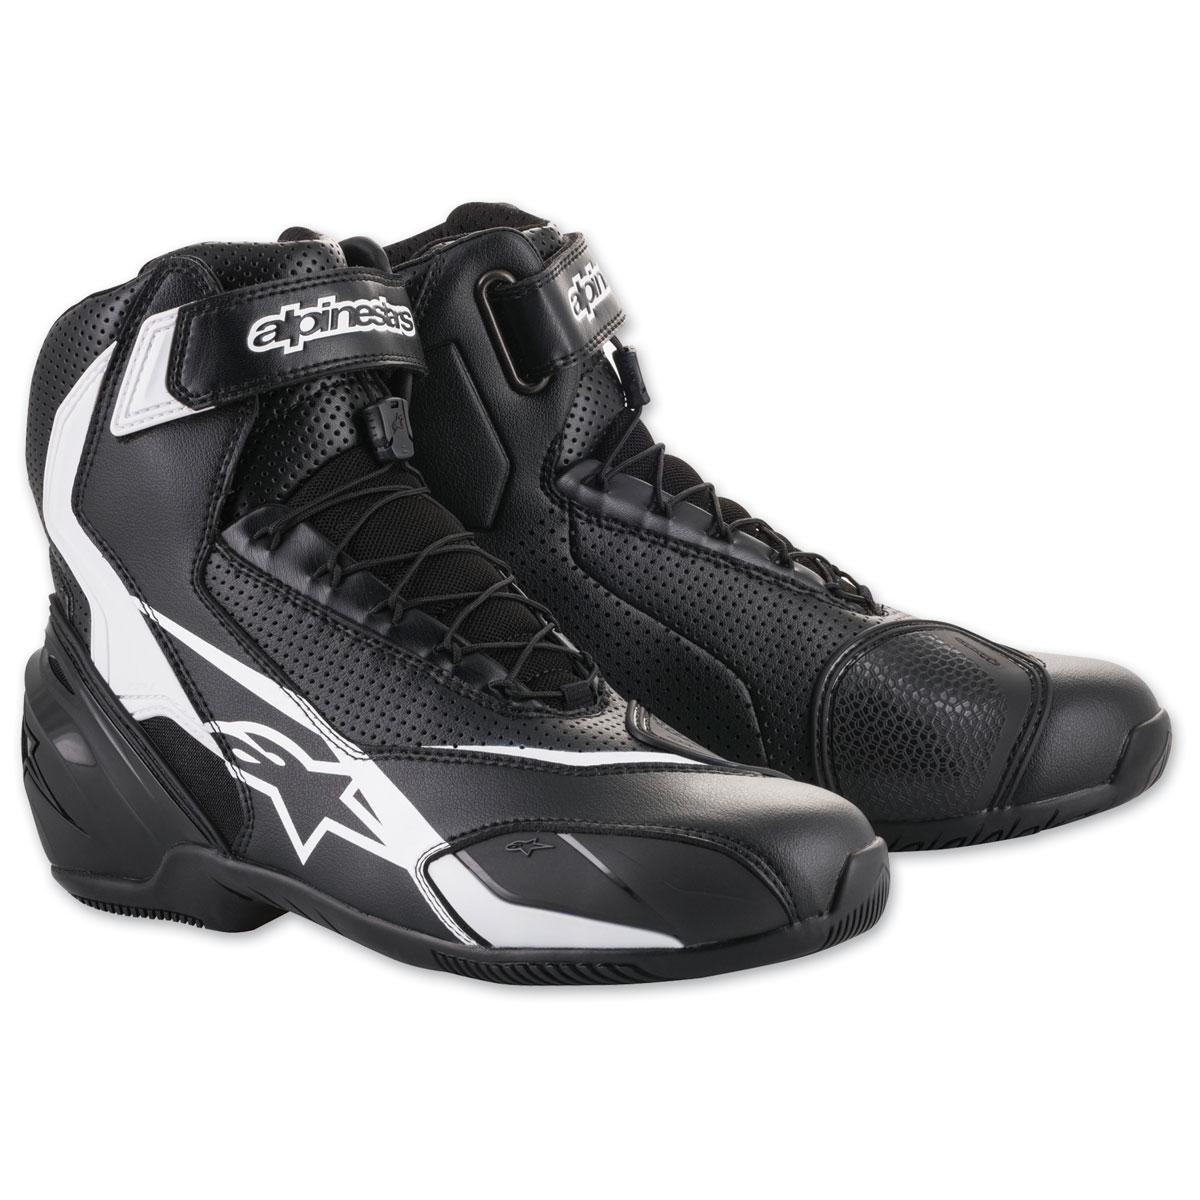 Alpinestars Men's SP-1 v2 Vented Black/White Boots